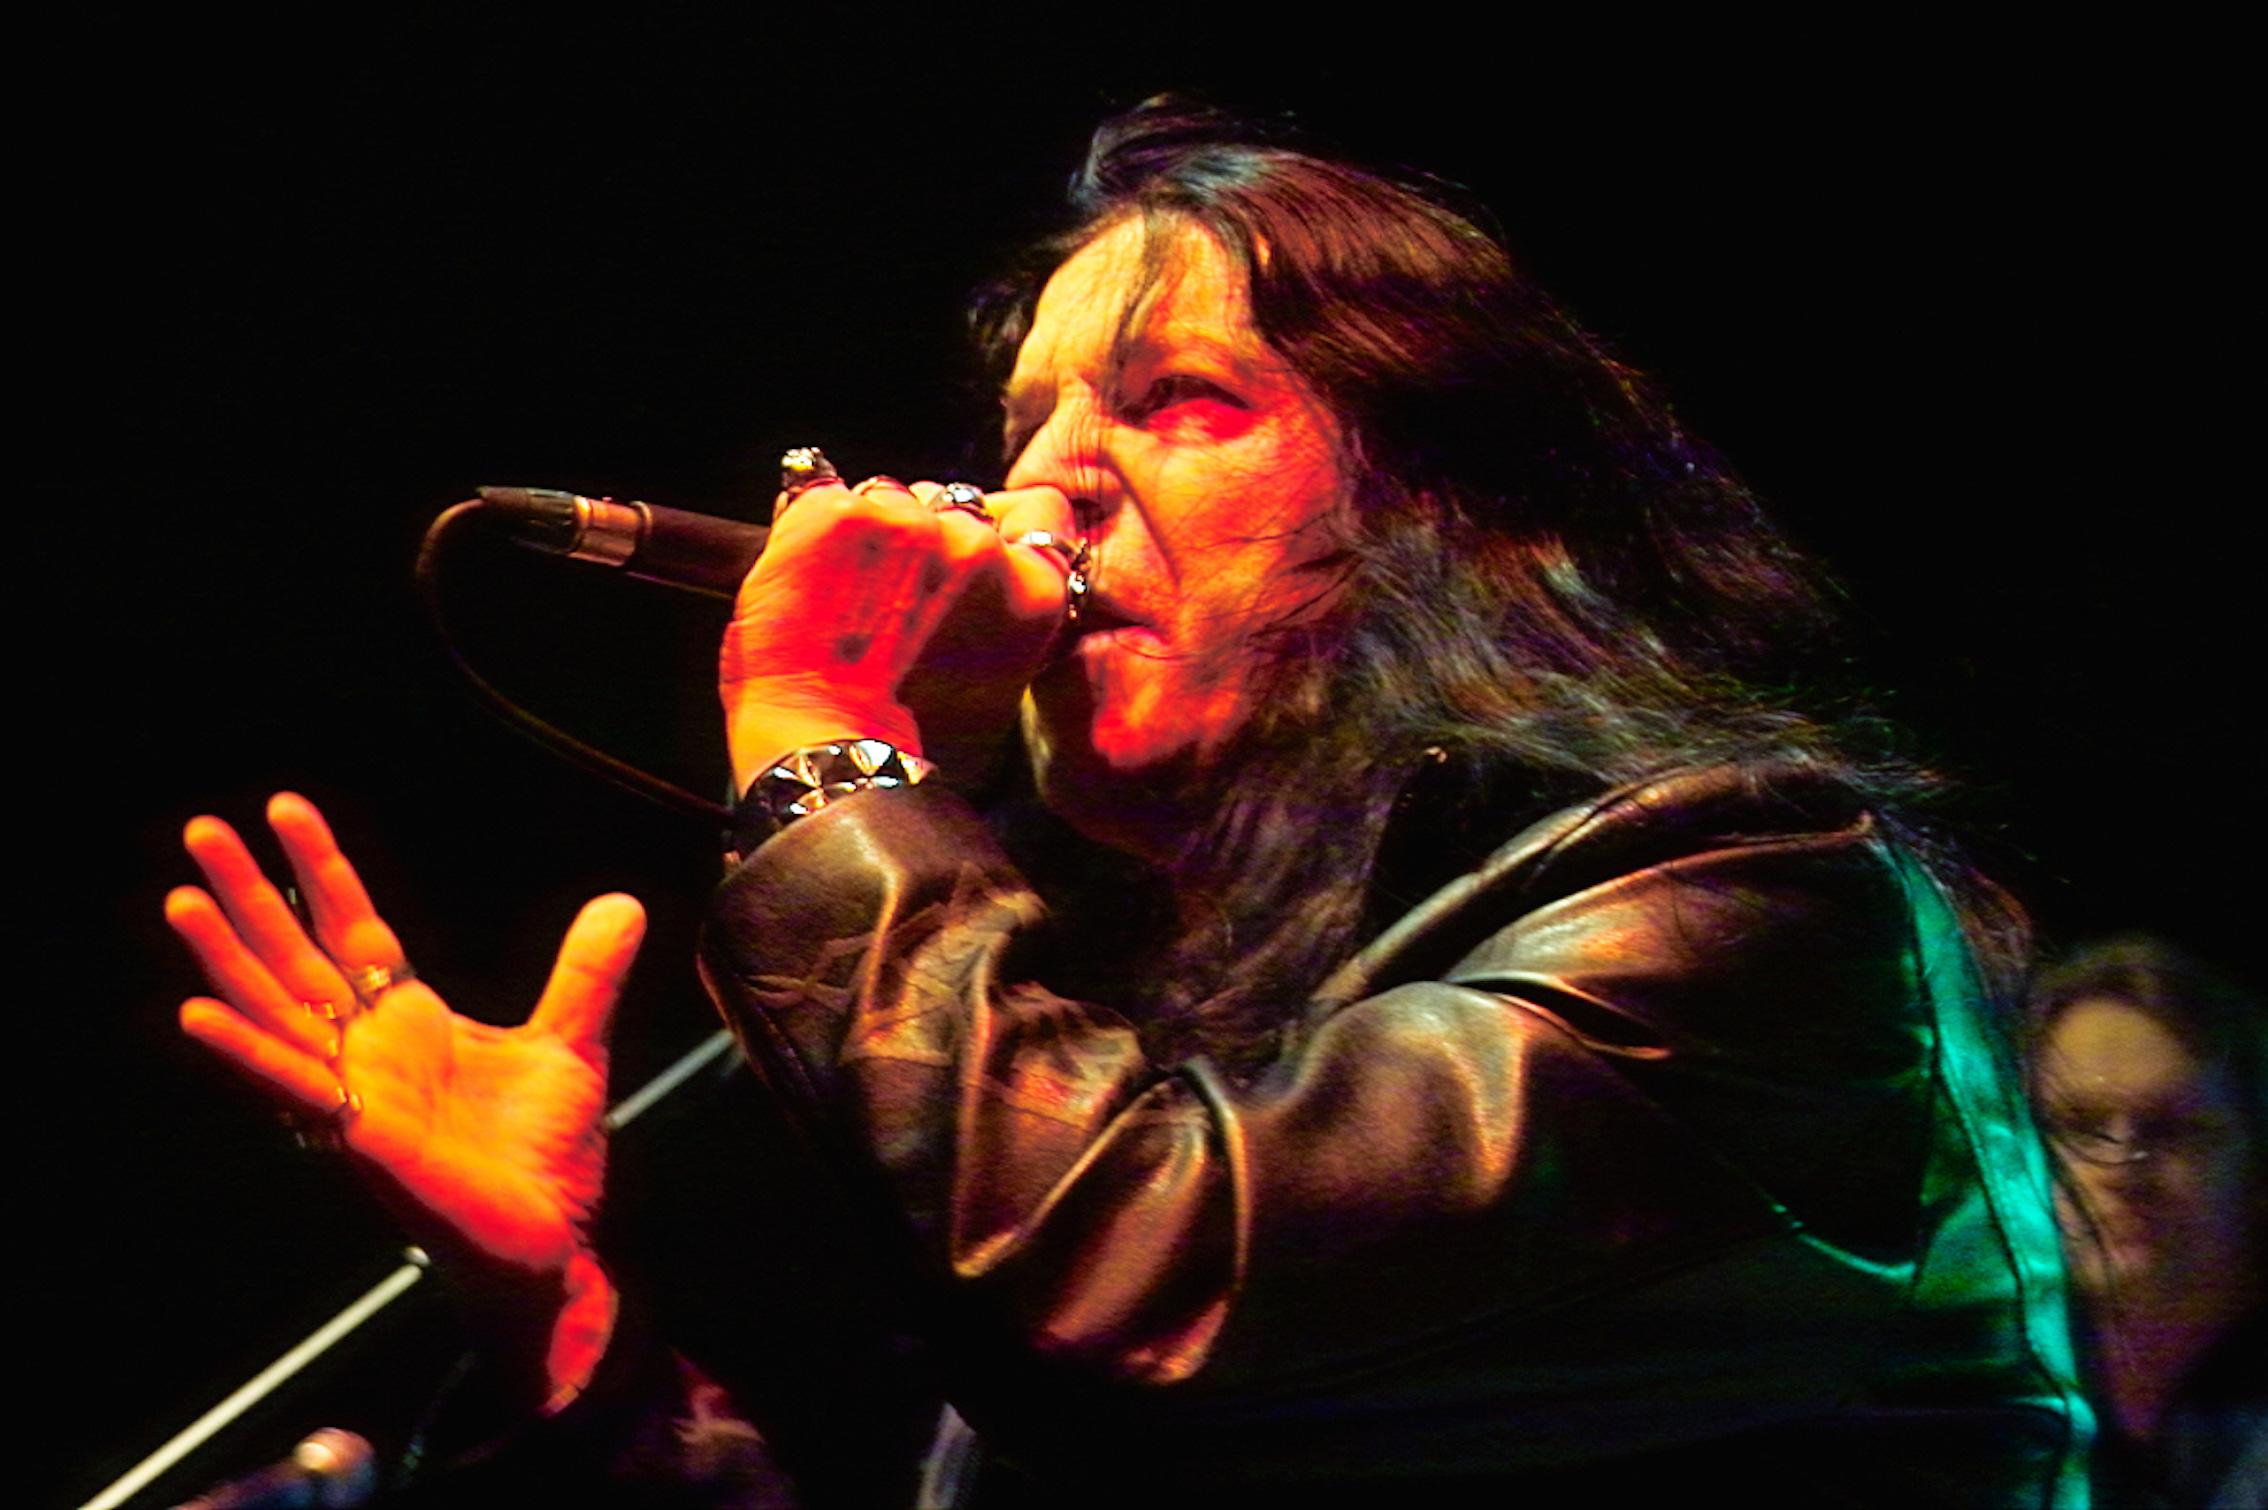 Tommy Lion - Vocals